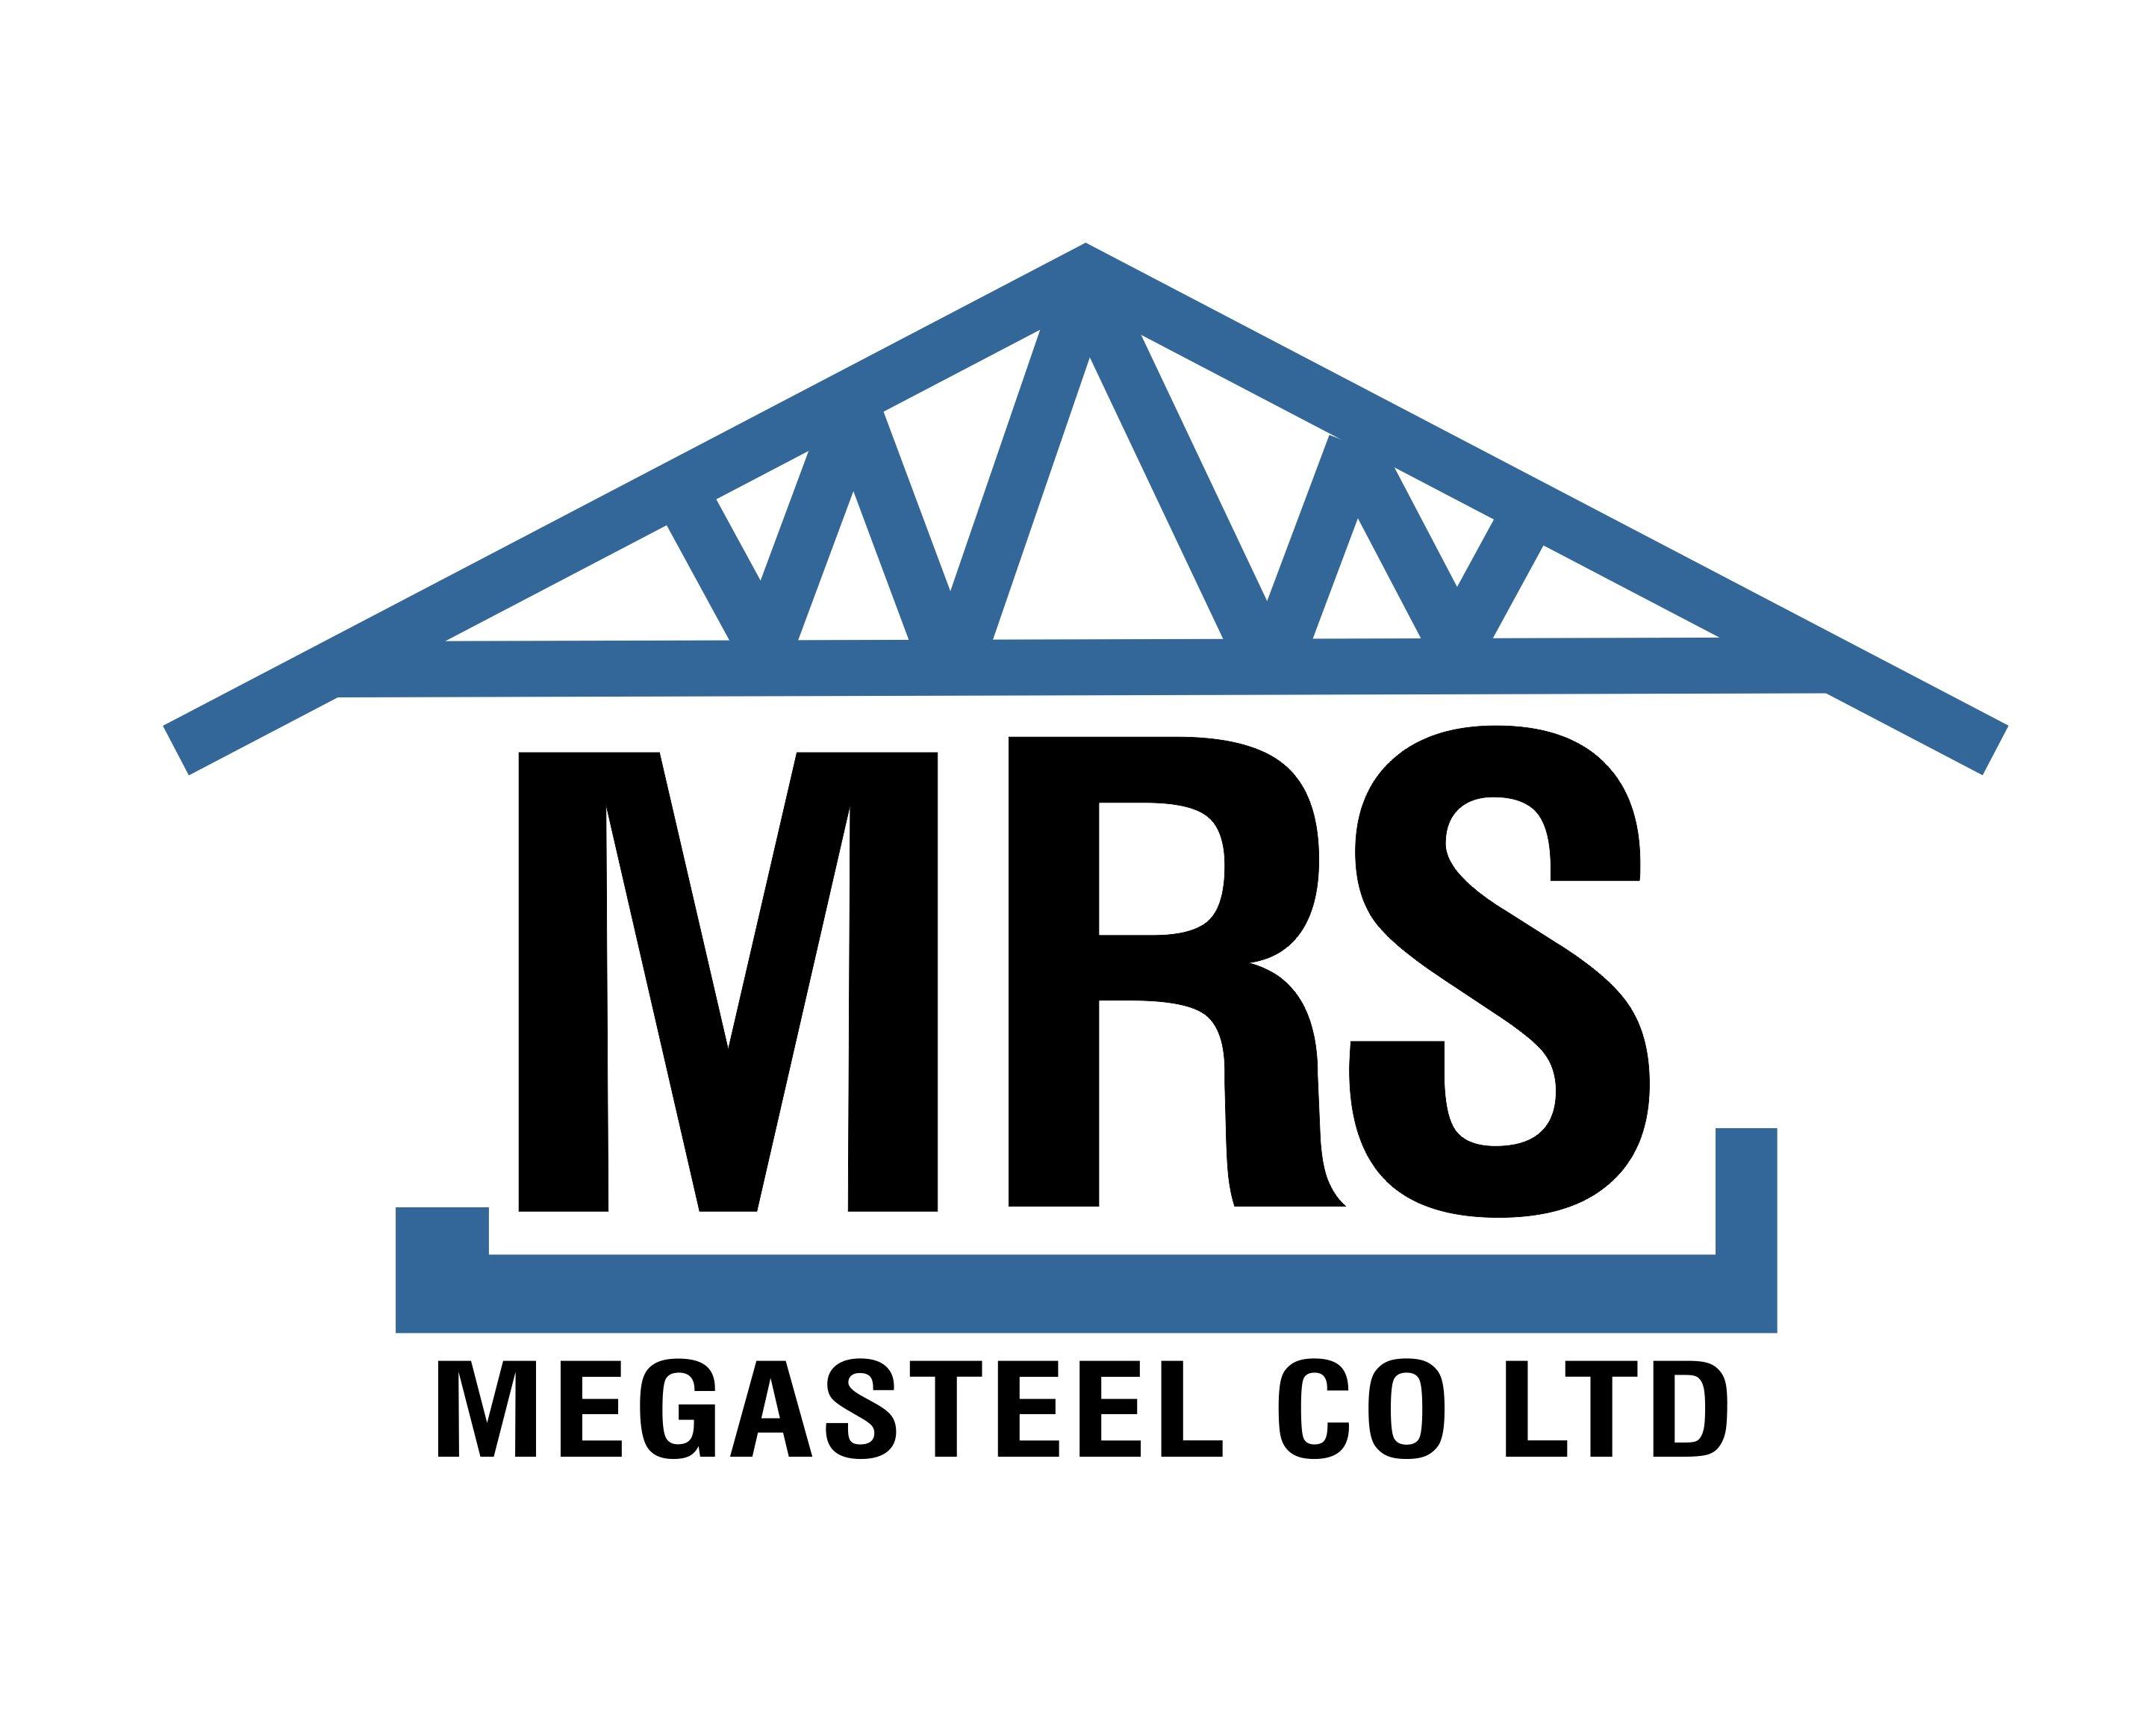 megasteel roofing systems